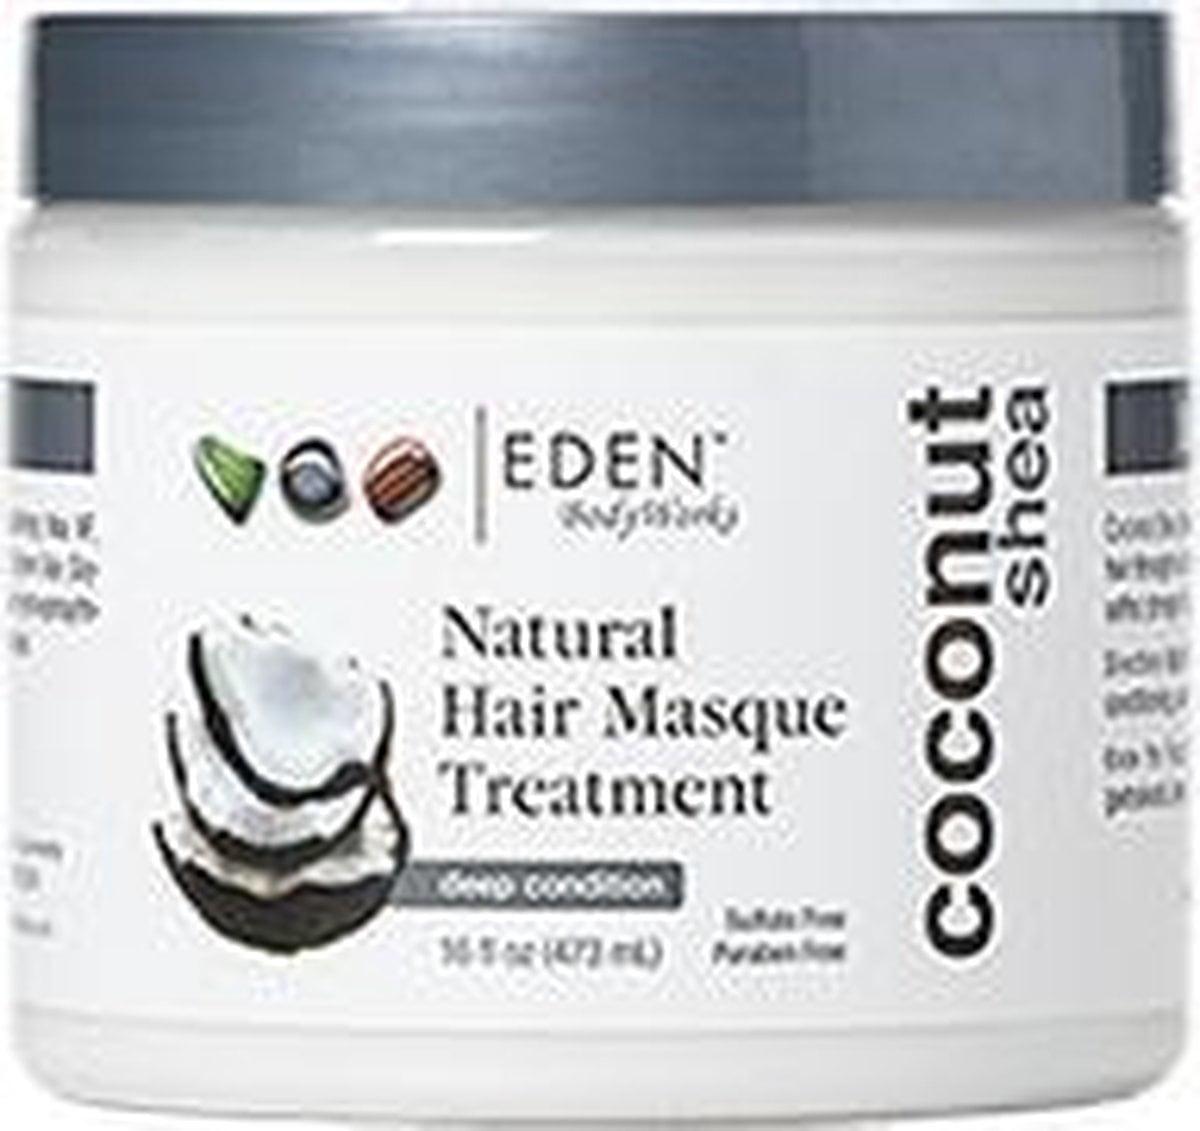 EDEN BodyWorks Coconut Shea Hair Masque 473 ml